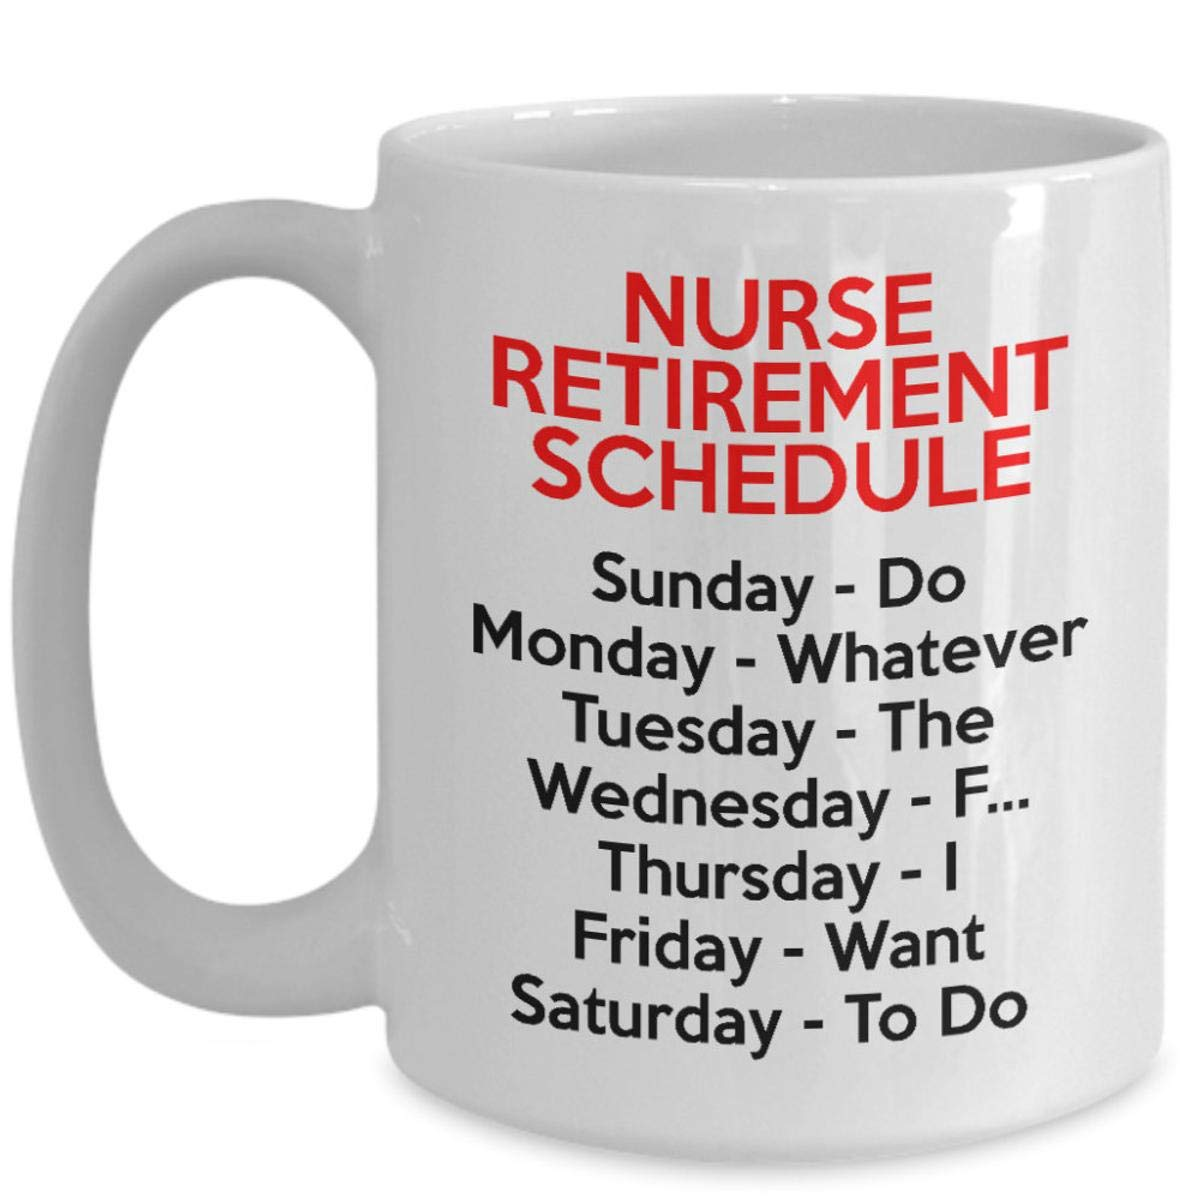 Amazon.com: Nurse Retirement Gifts For Women And Men, Retired Nurse Mug, Funny Gift Idea For Retiring Nurse, Funny Retired Nurse Gag Gift, ...